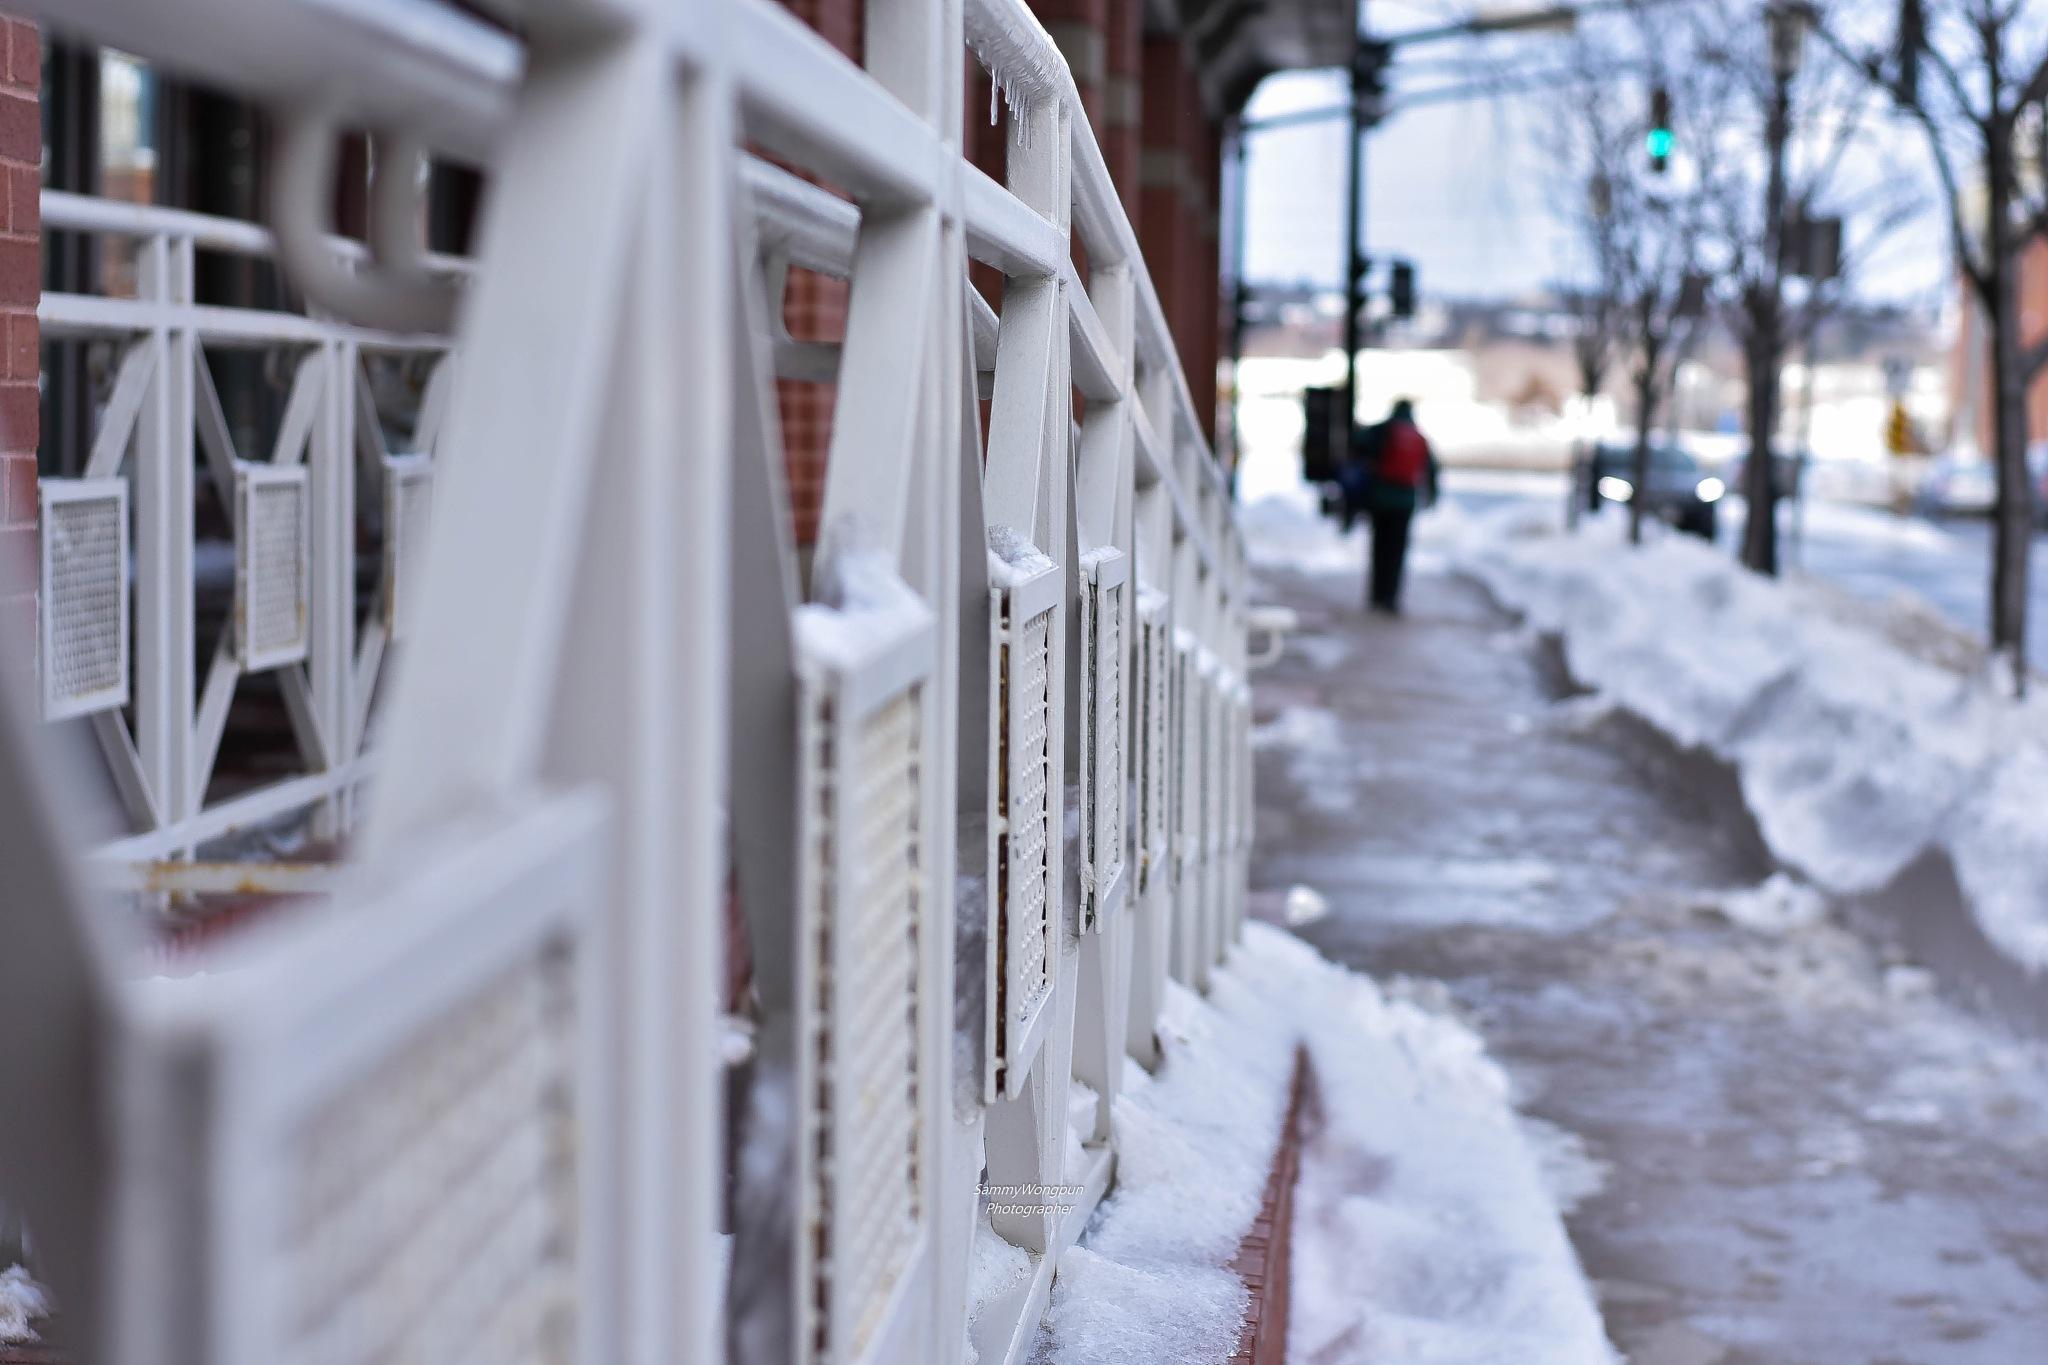 Cold Fredericton by sammywongpun